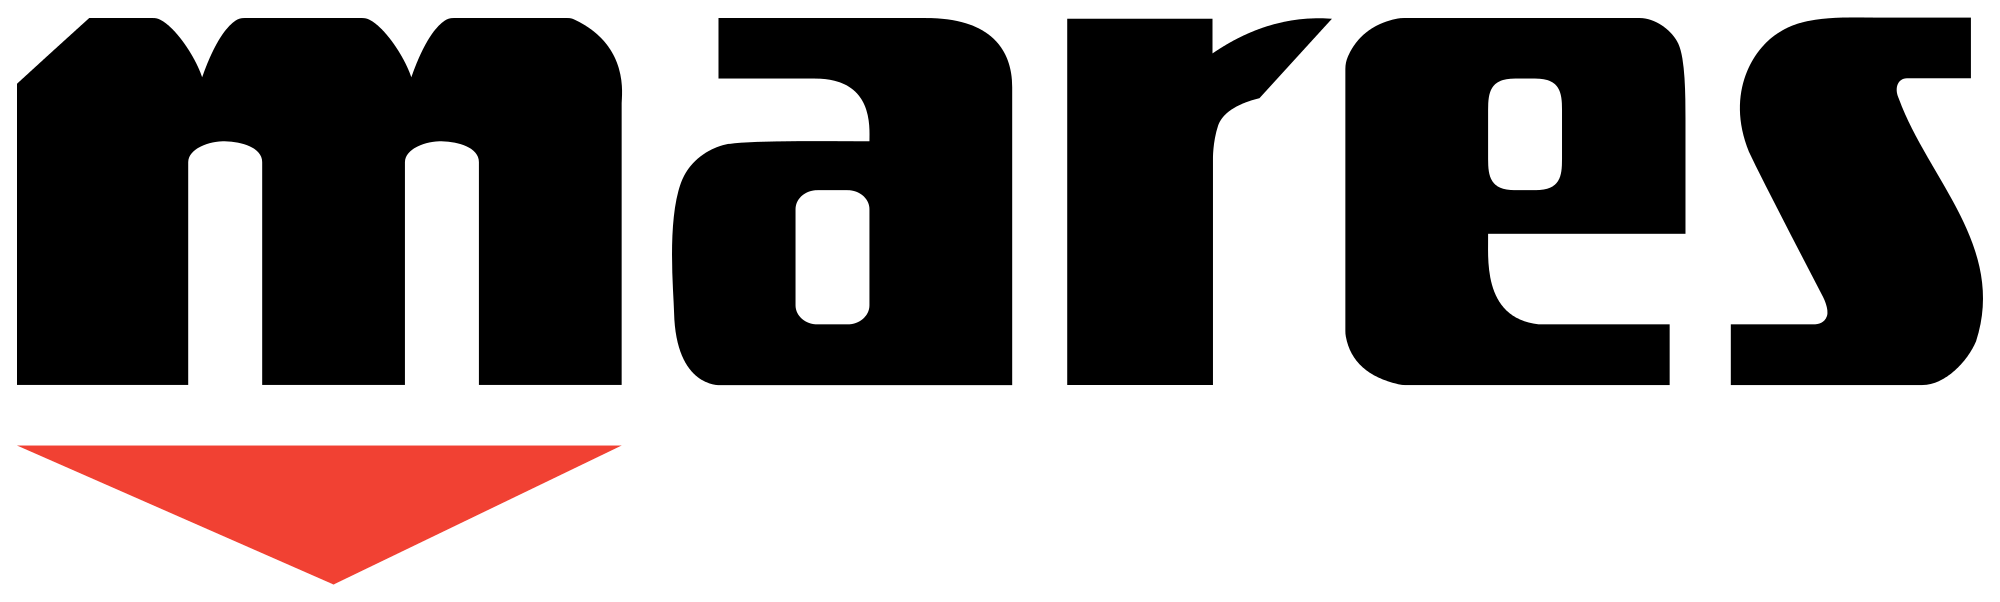 Mares_logo. cbs